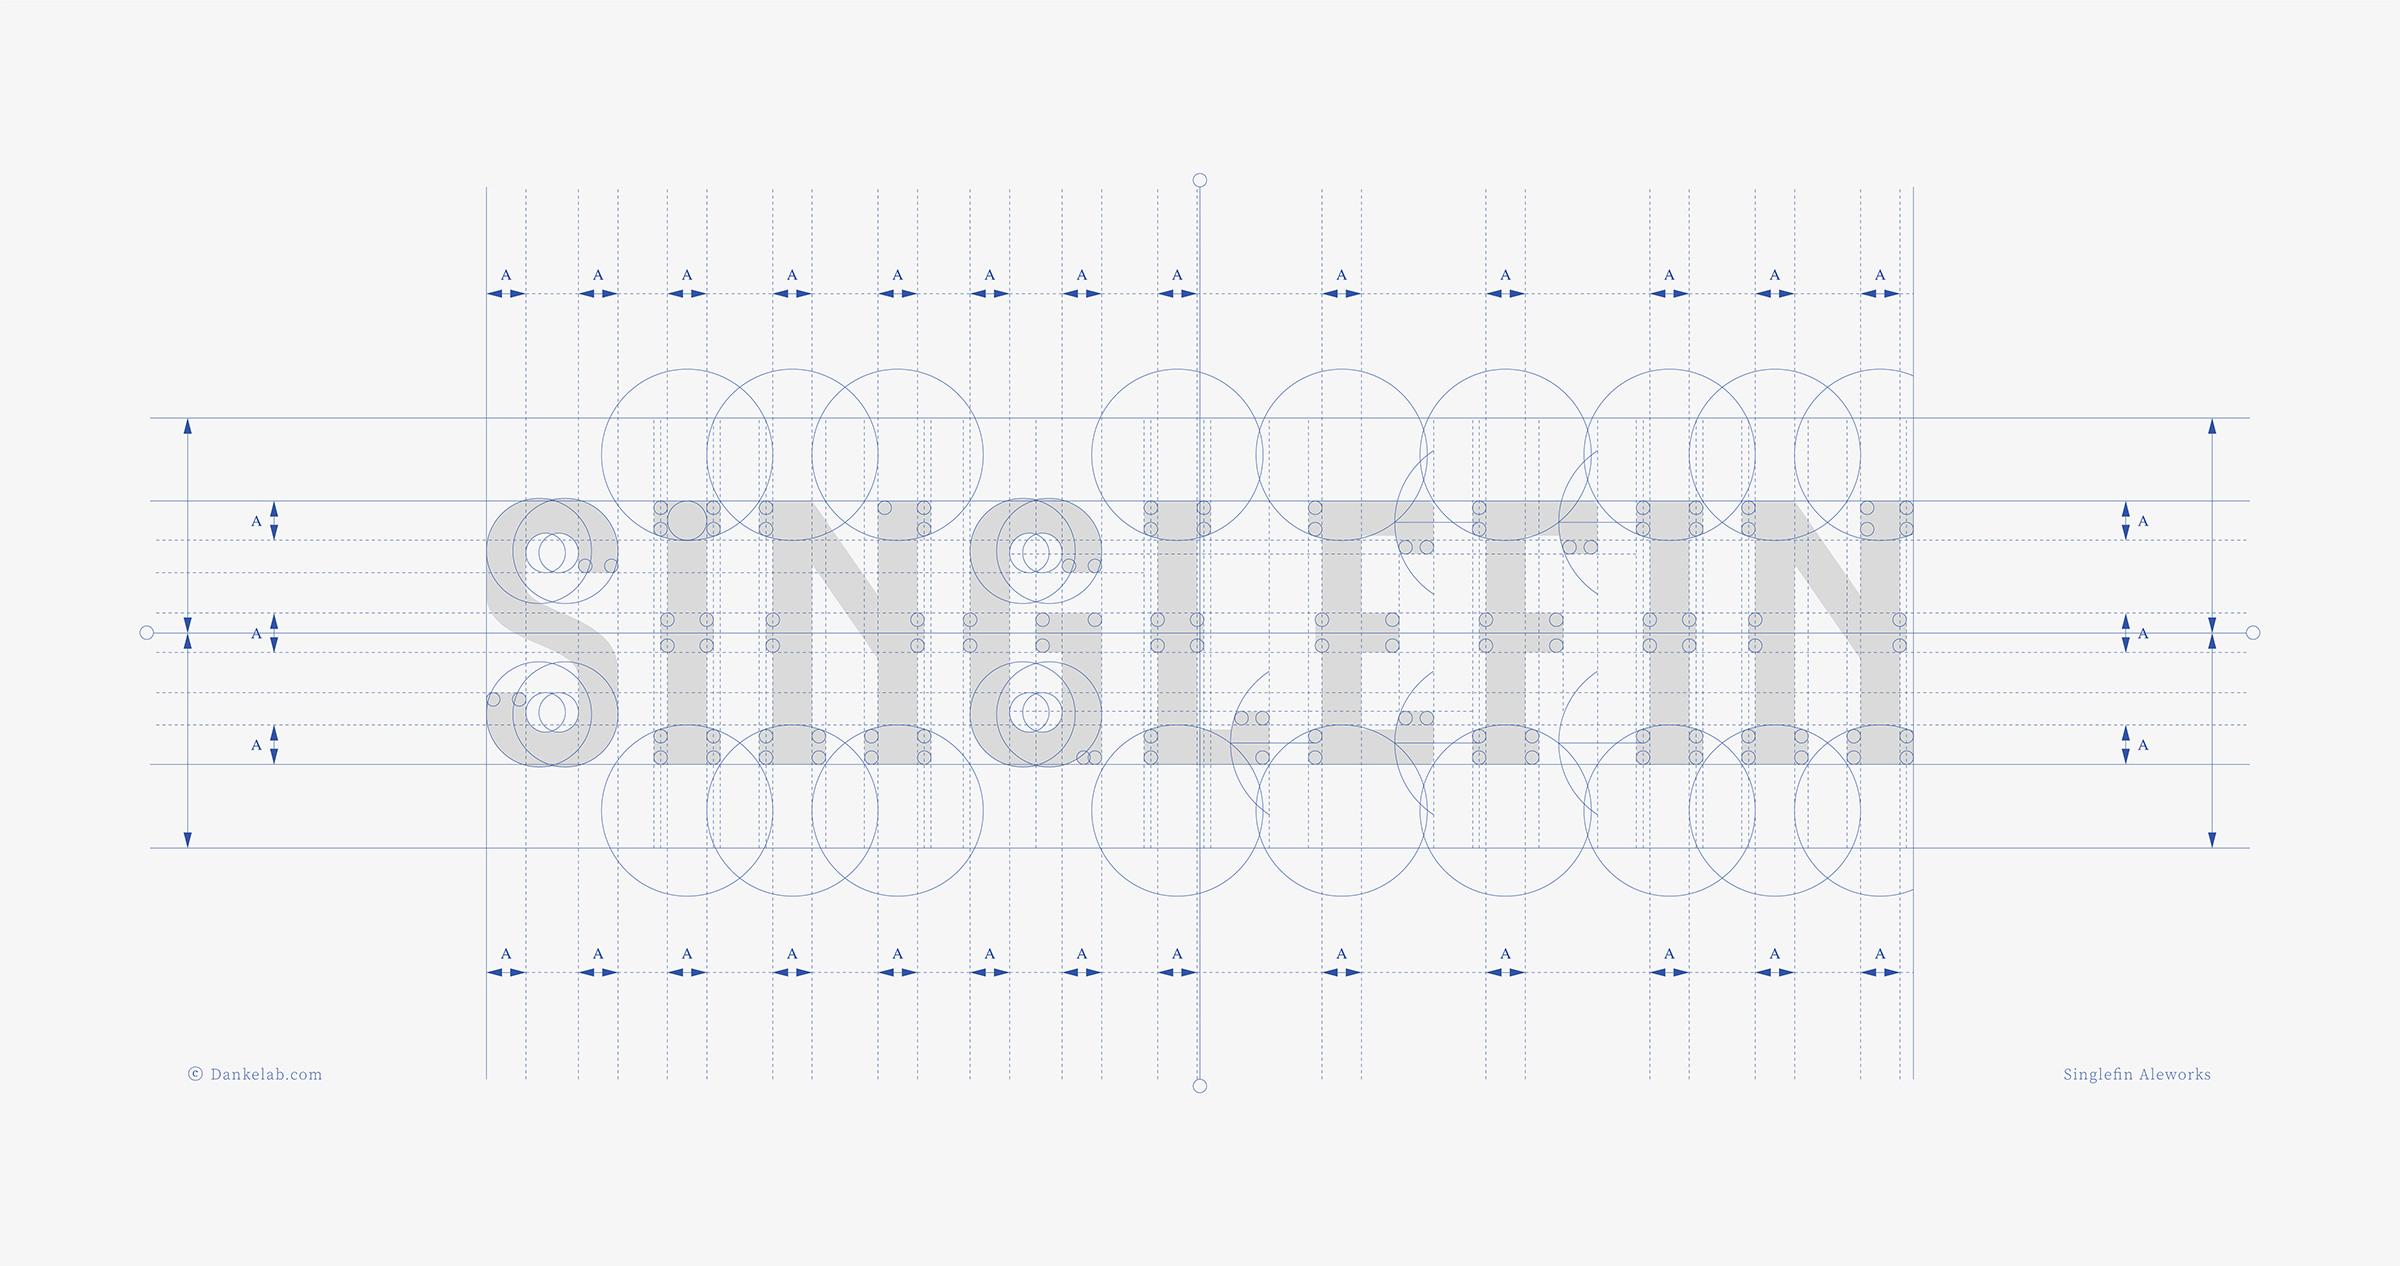 dankelab_Singlefin Aleworks_B_01